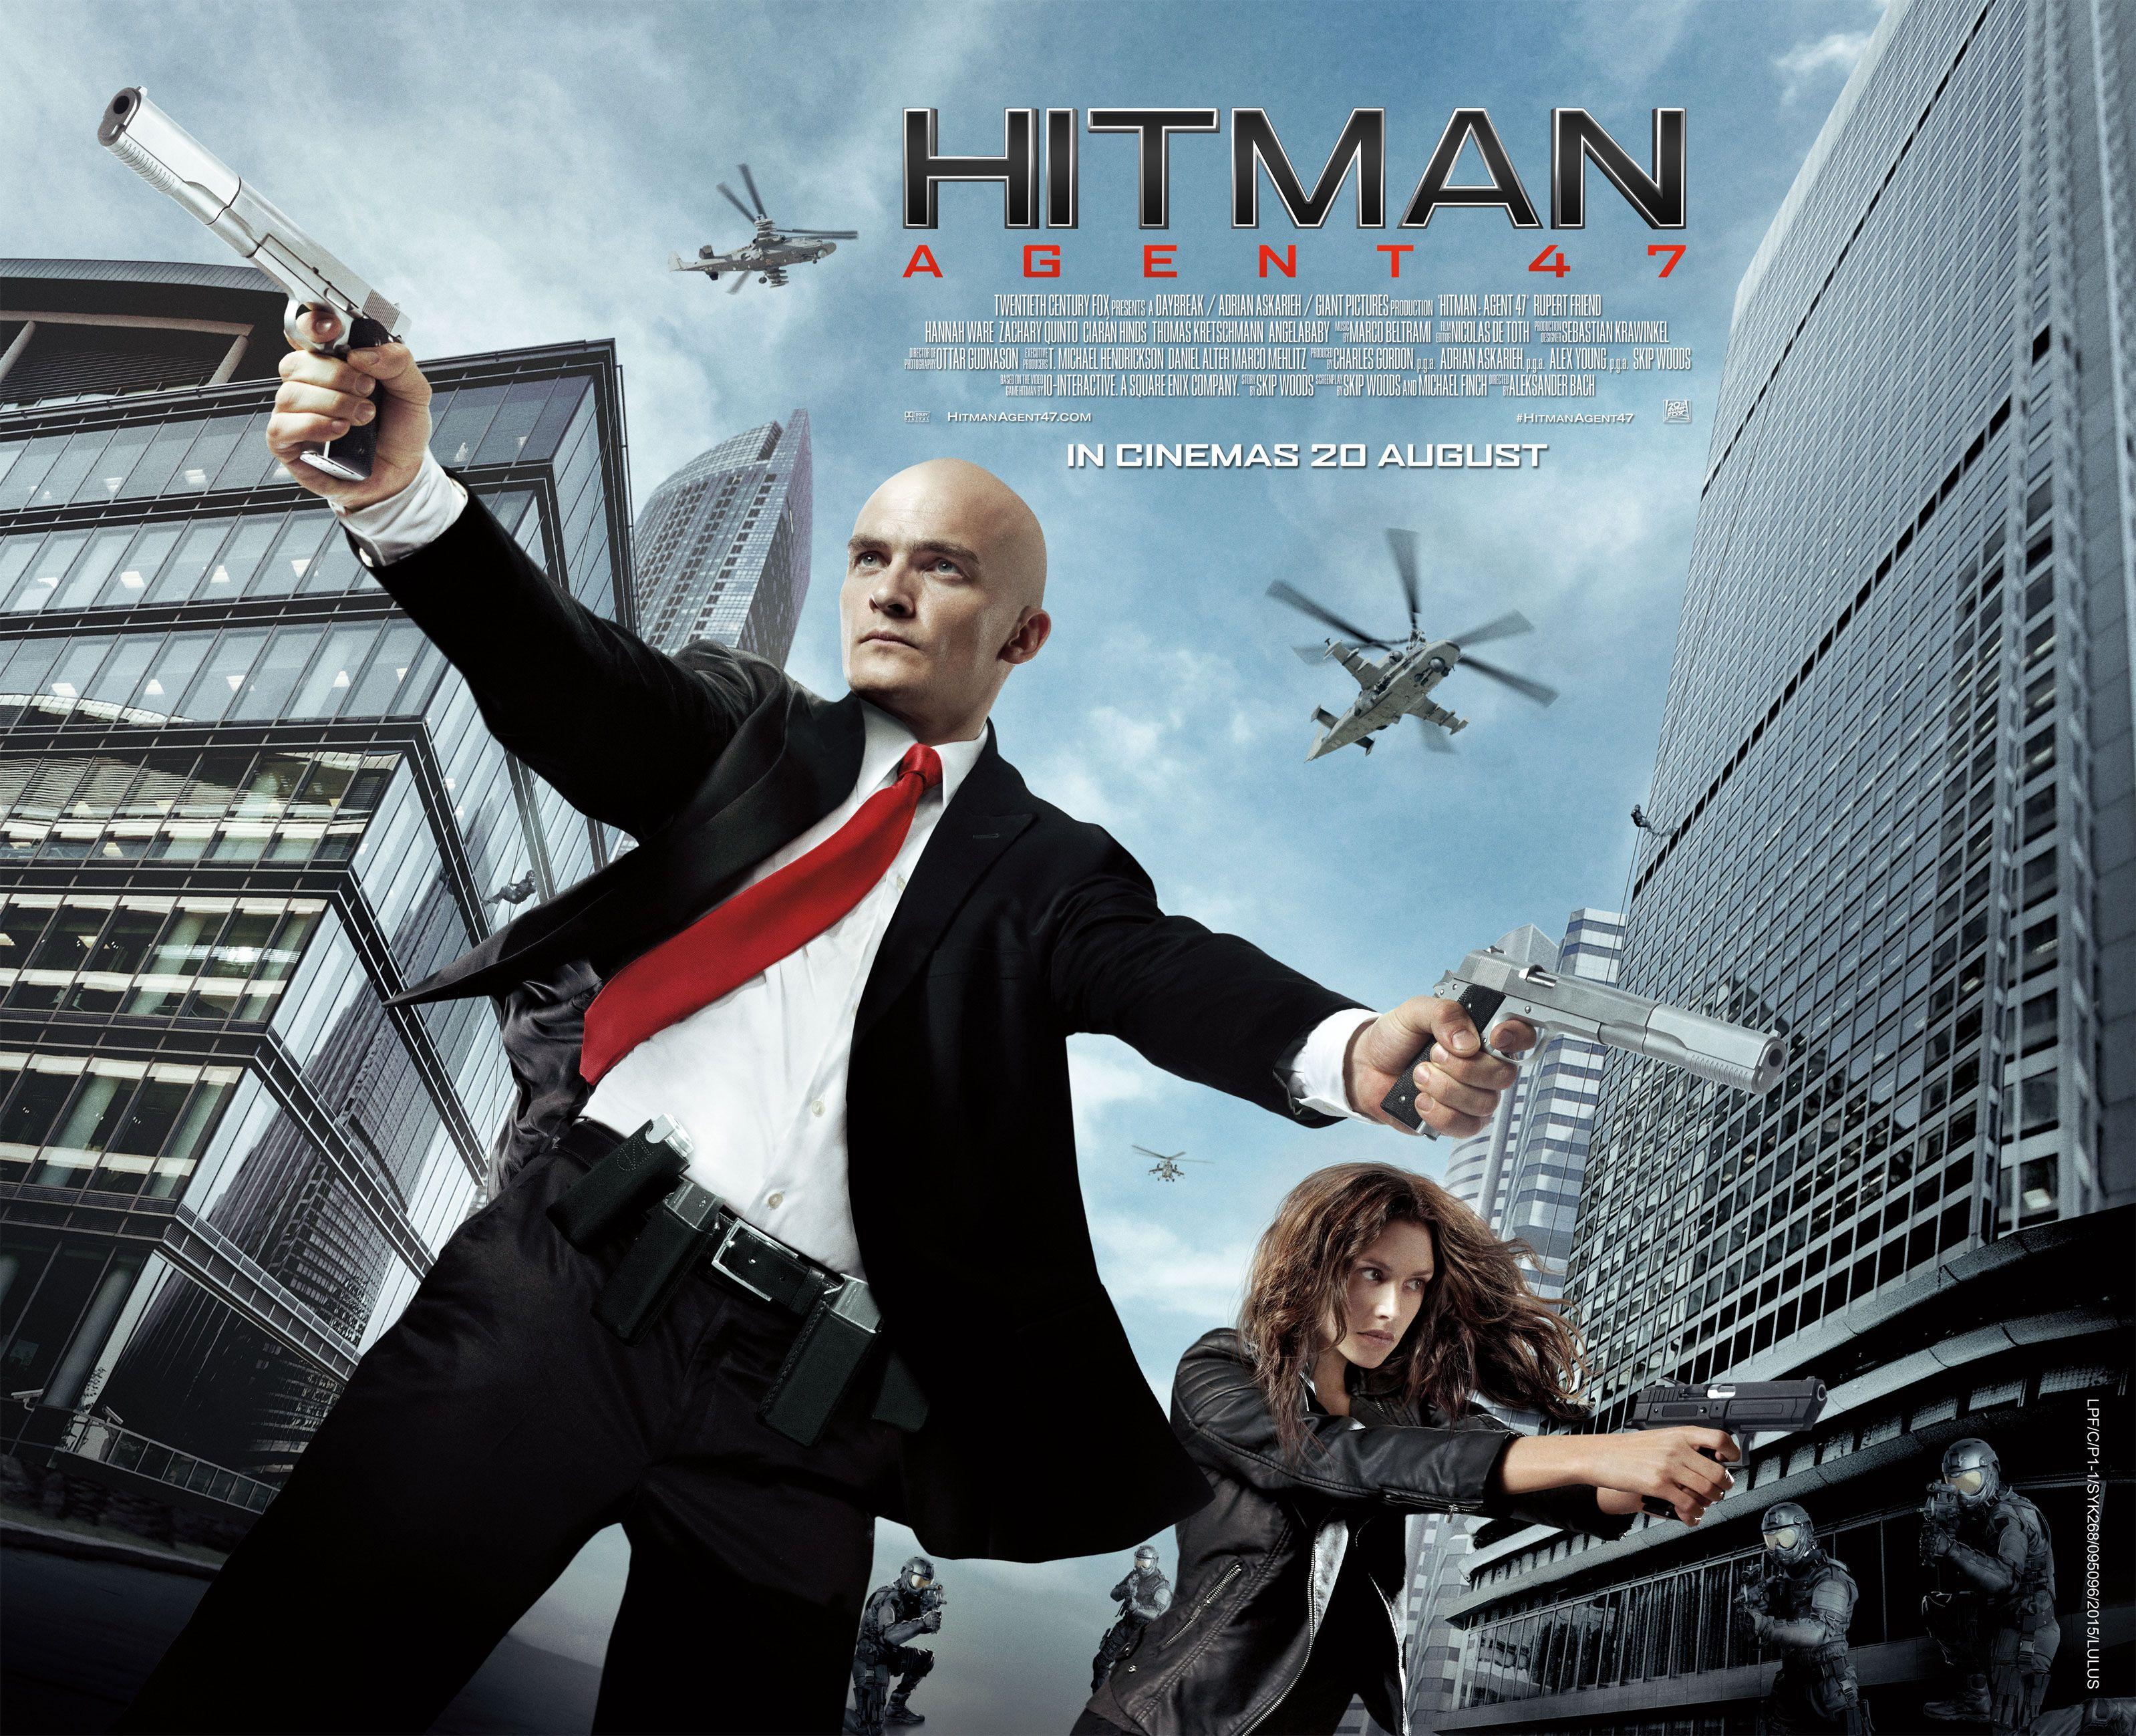 hitman agent 47 locandina vish pinterest agent 47 and hitman agent 47. Black Bedroom Furniture Sets. Home Design Ideas